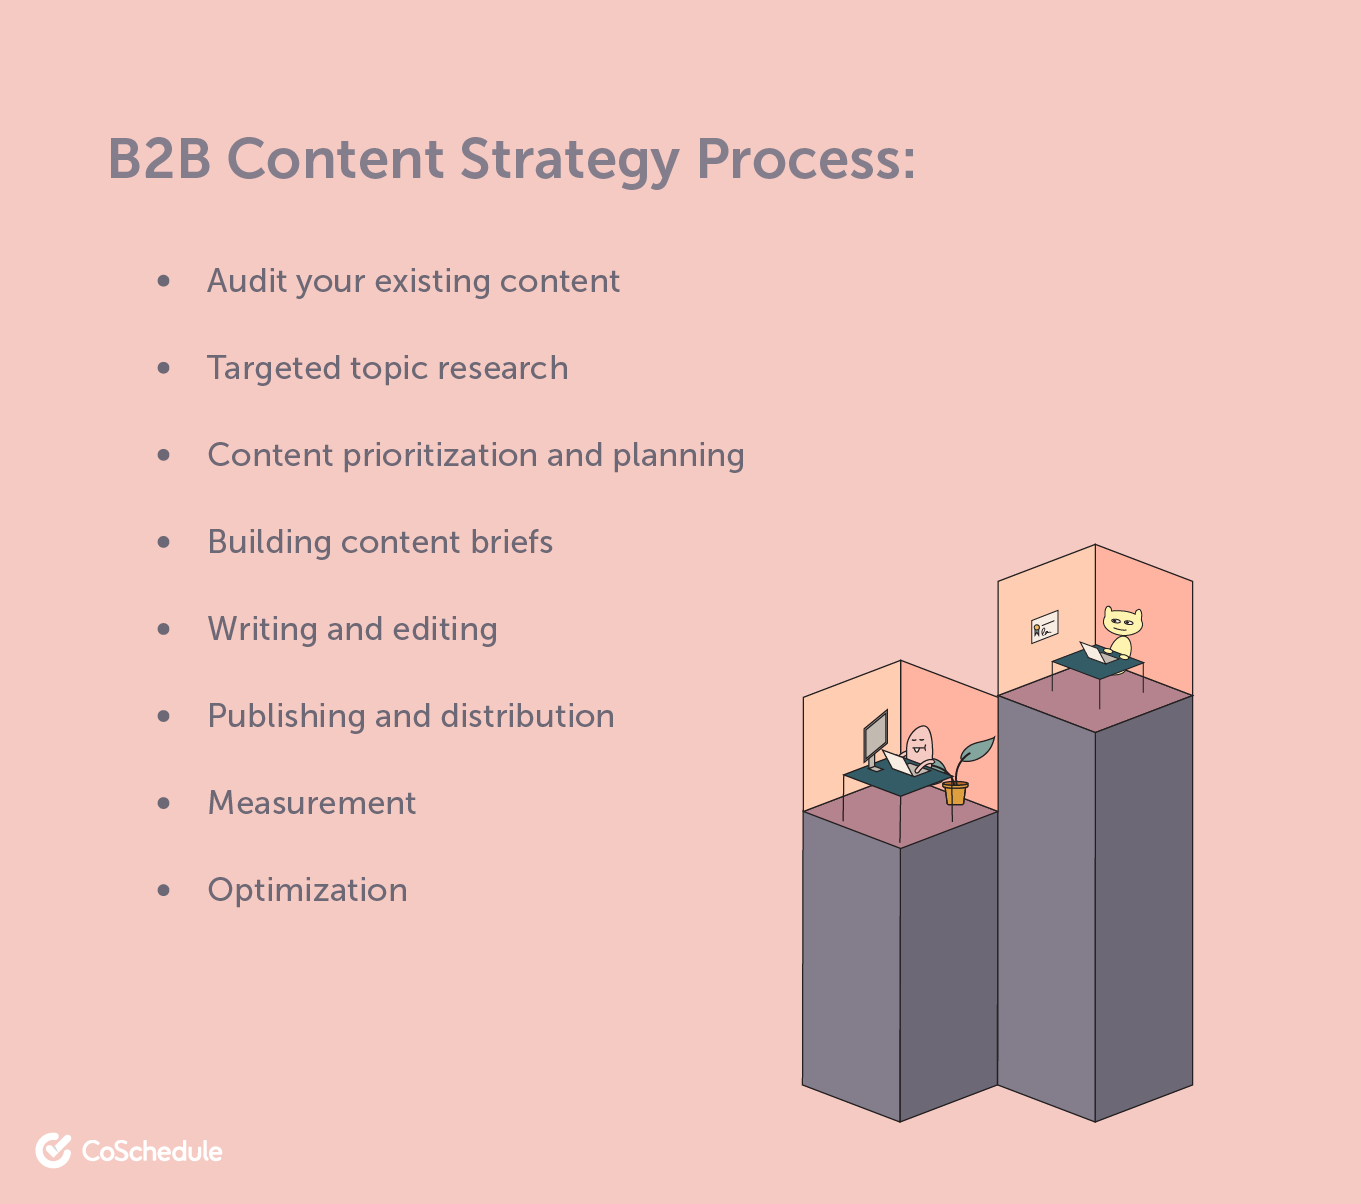 B2B content strategy process